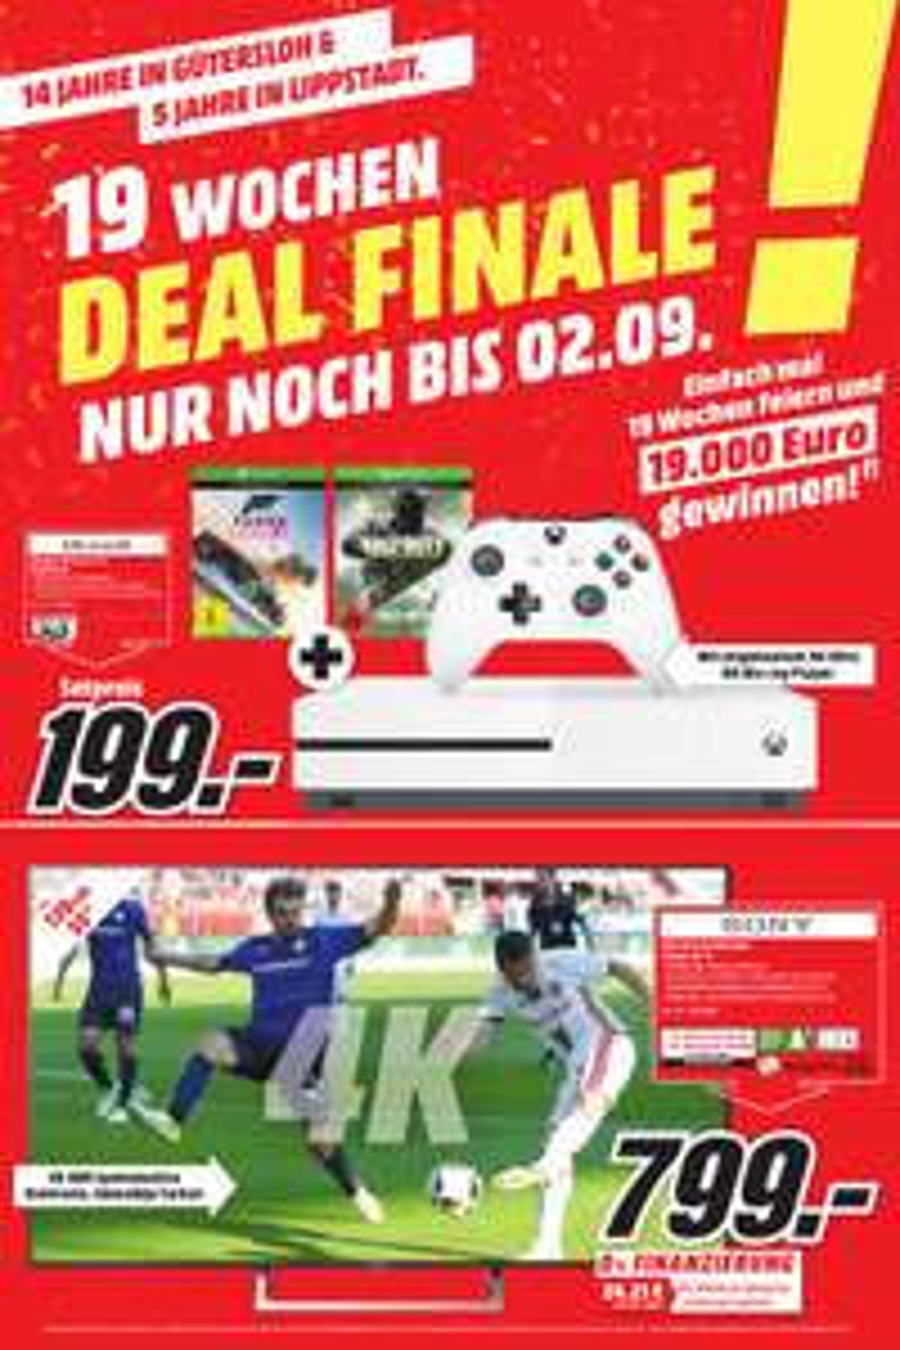 [Lokal Media Markt Gütersloh/?Lippstadt?] XBOX ONE S 1TB inkl. Forza Horizon 3  COD Infinit Warfare